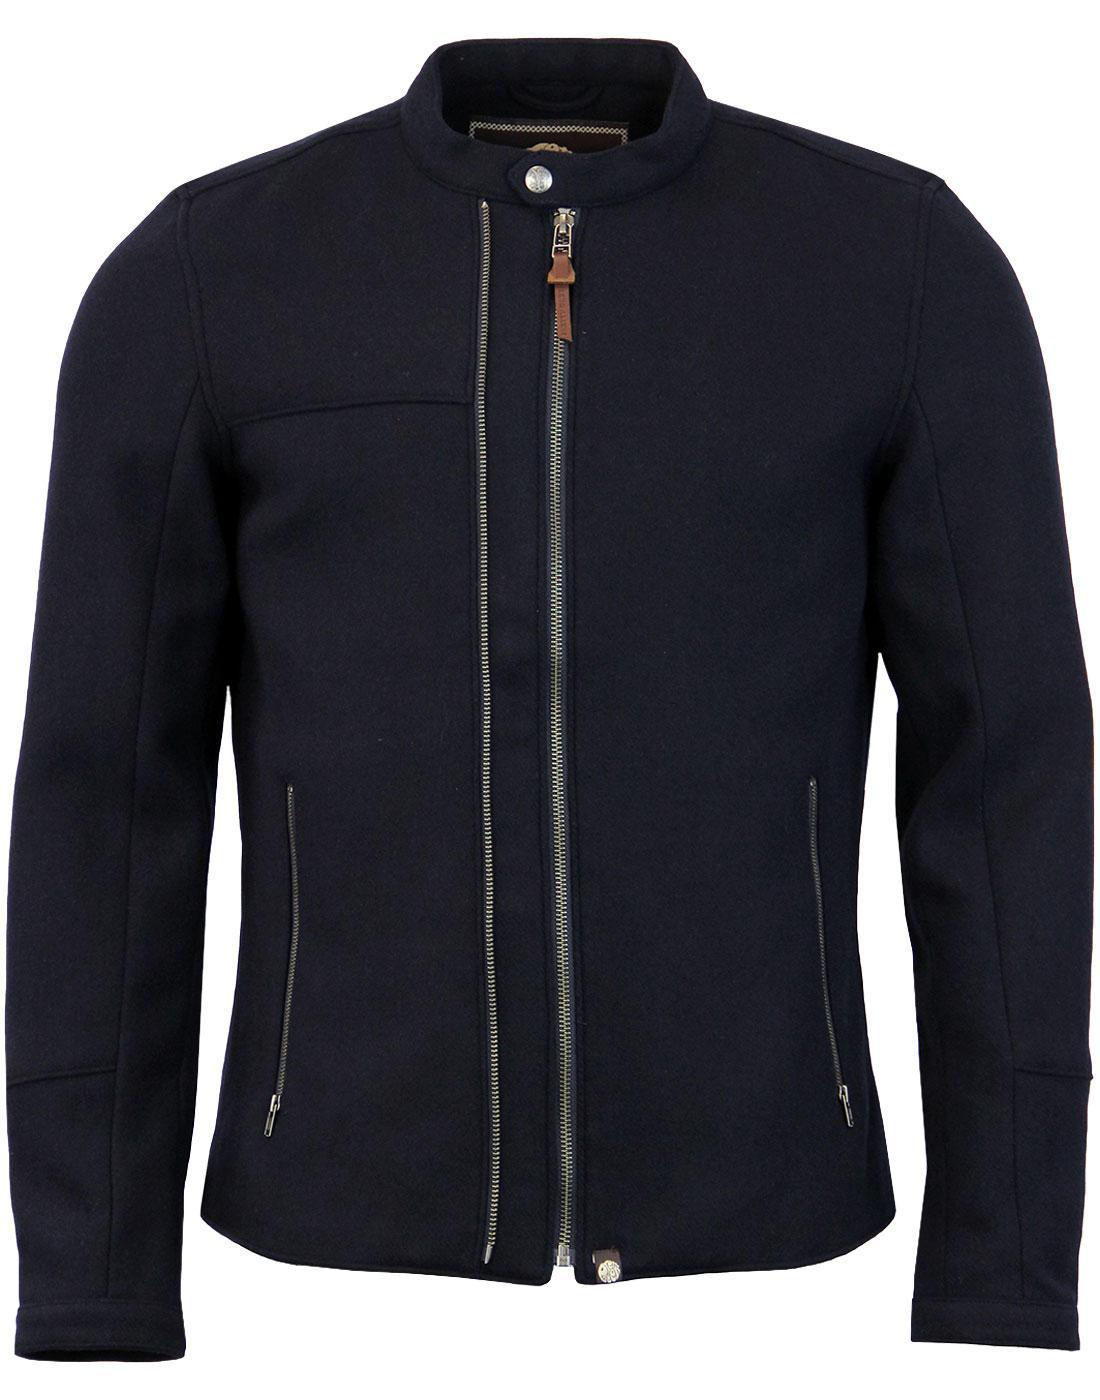 Towton Addison PRETTY GREEN 70s Wool Biker Jacket